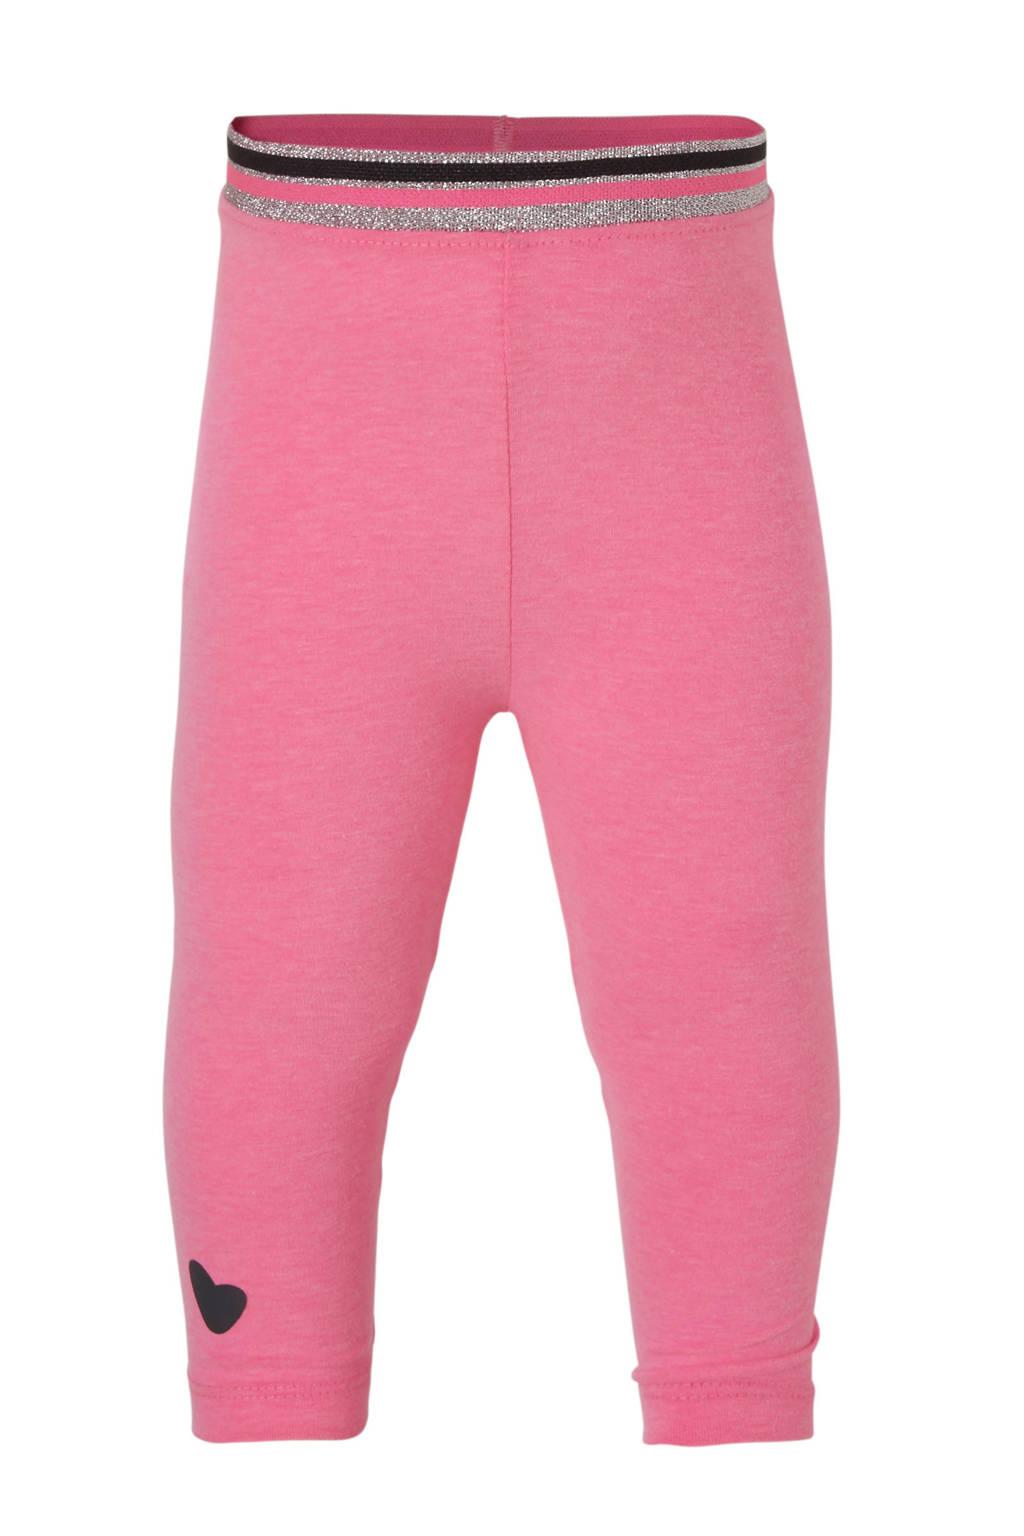 Quapi baby legging roze, Roze